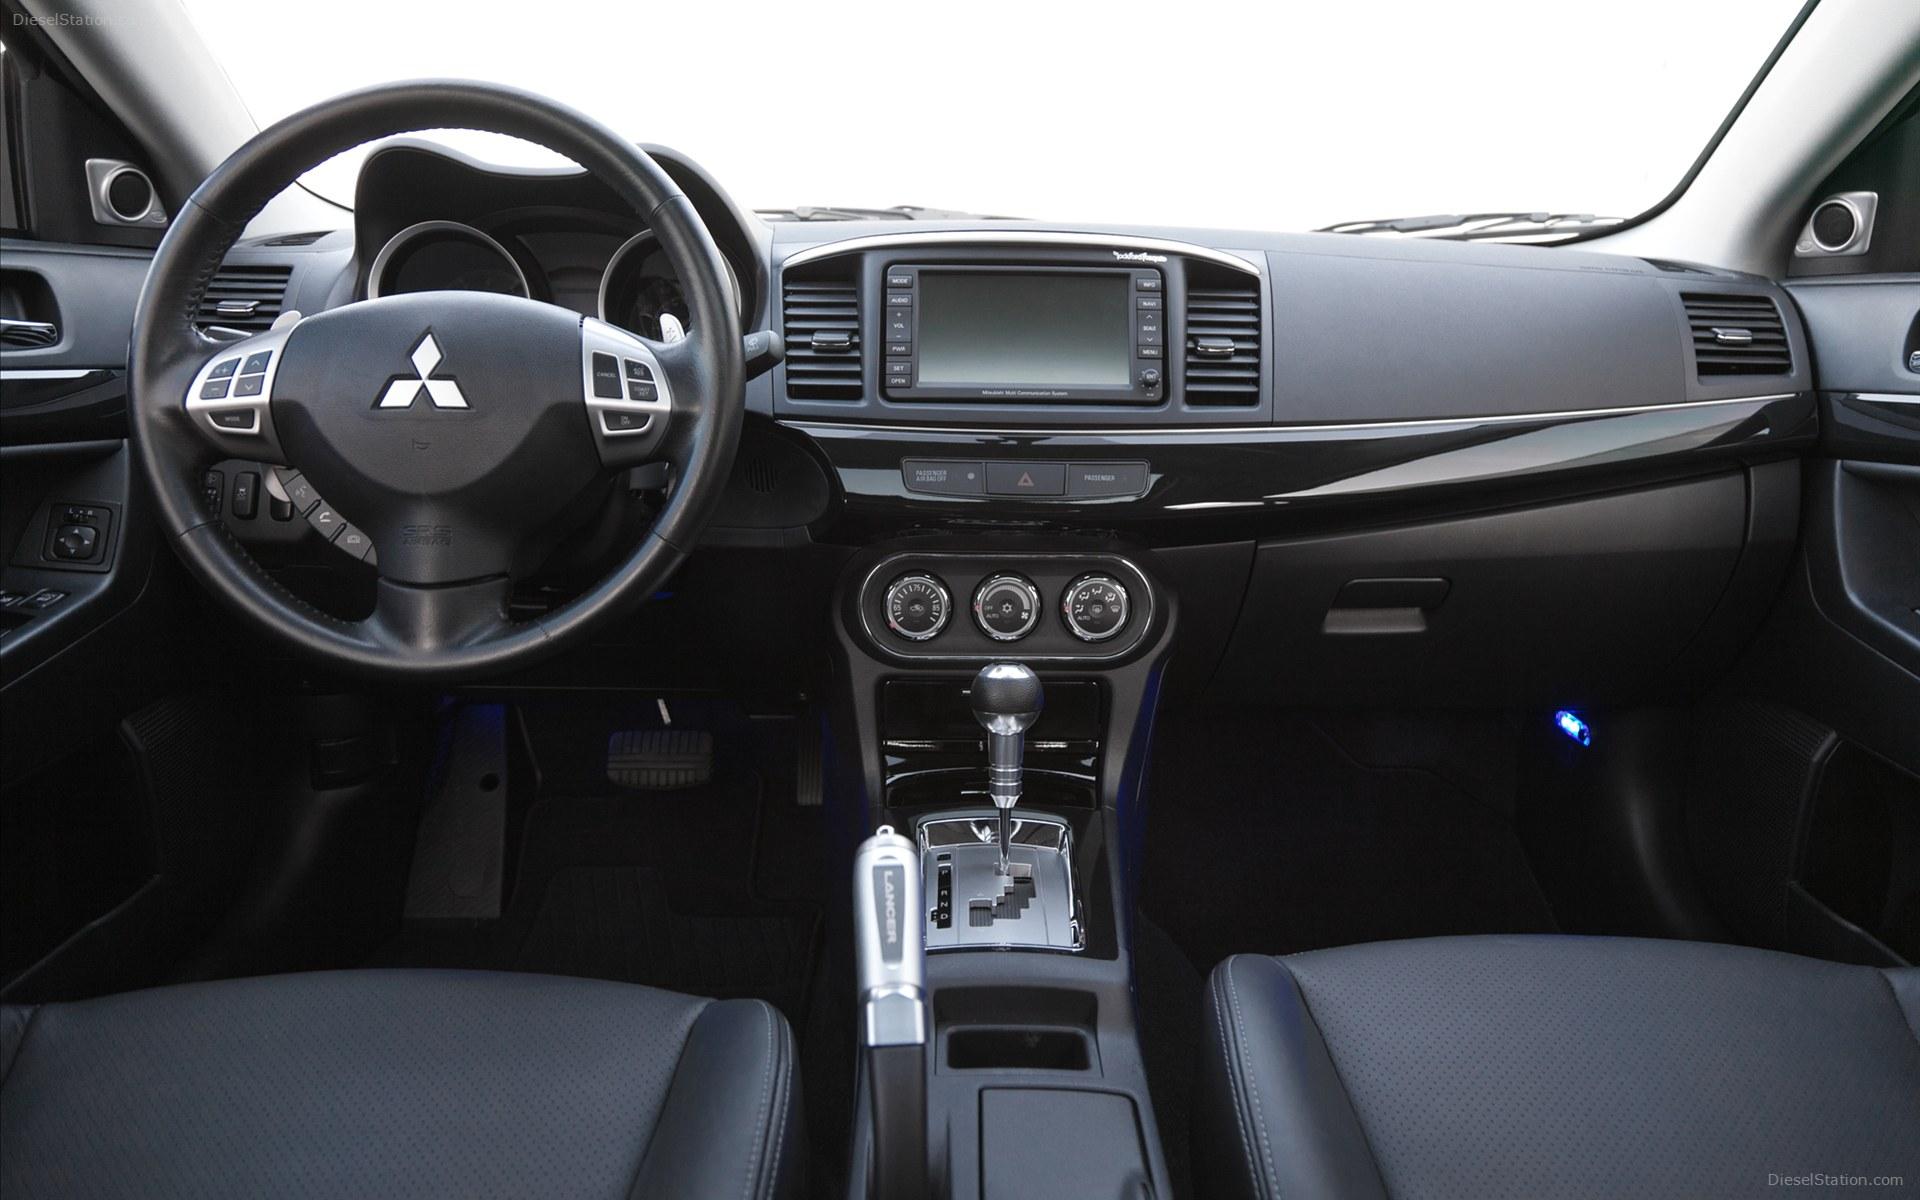 2013 Mitsubishi Lancer Information And Photos Zombiedrive Infiniti M37 Fuse Box 19